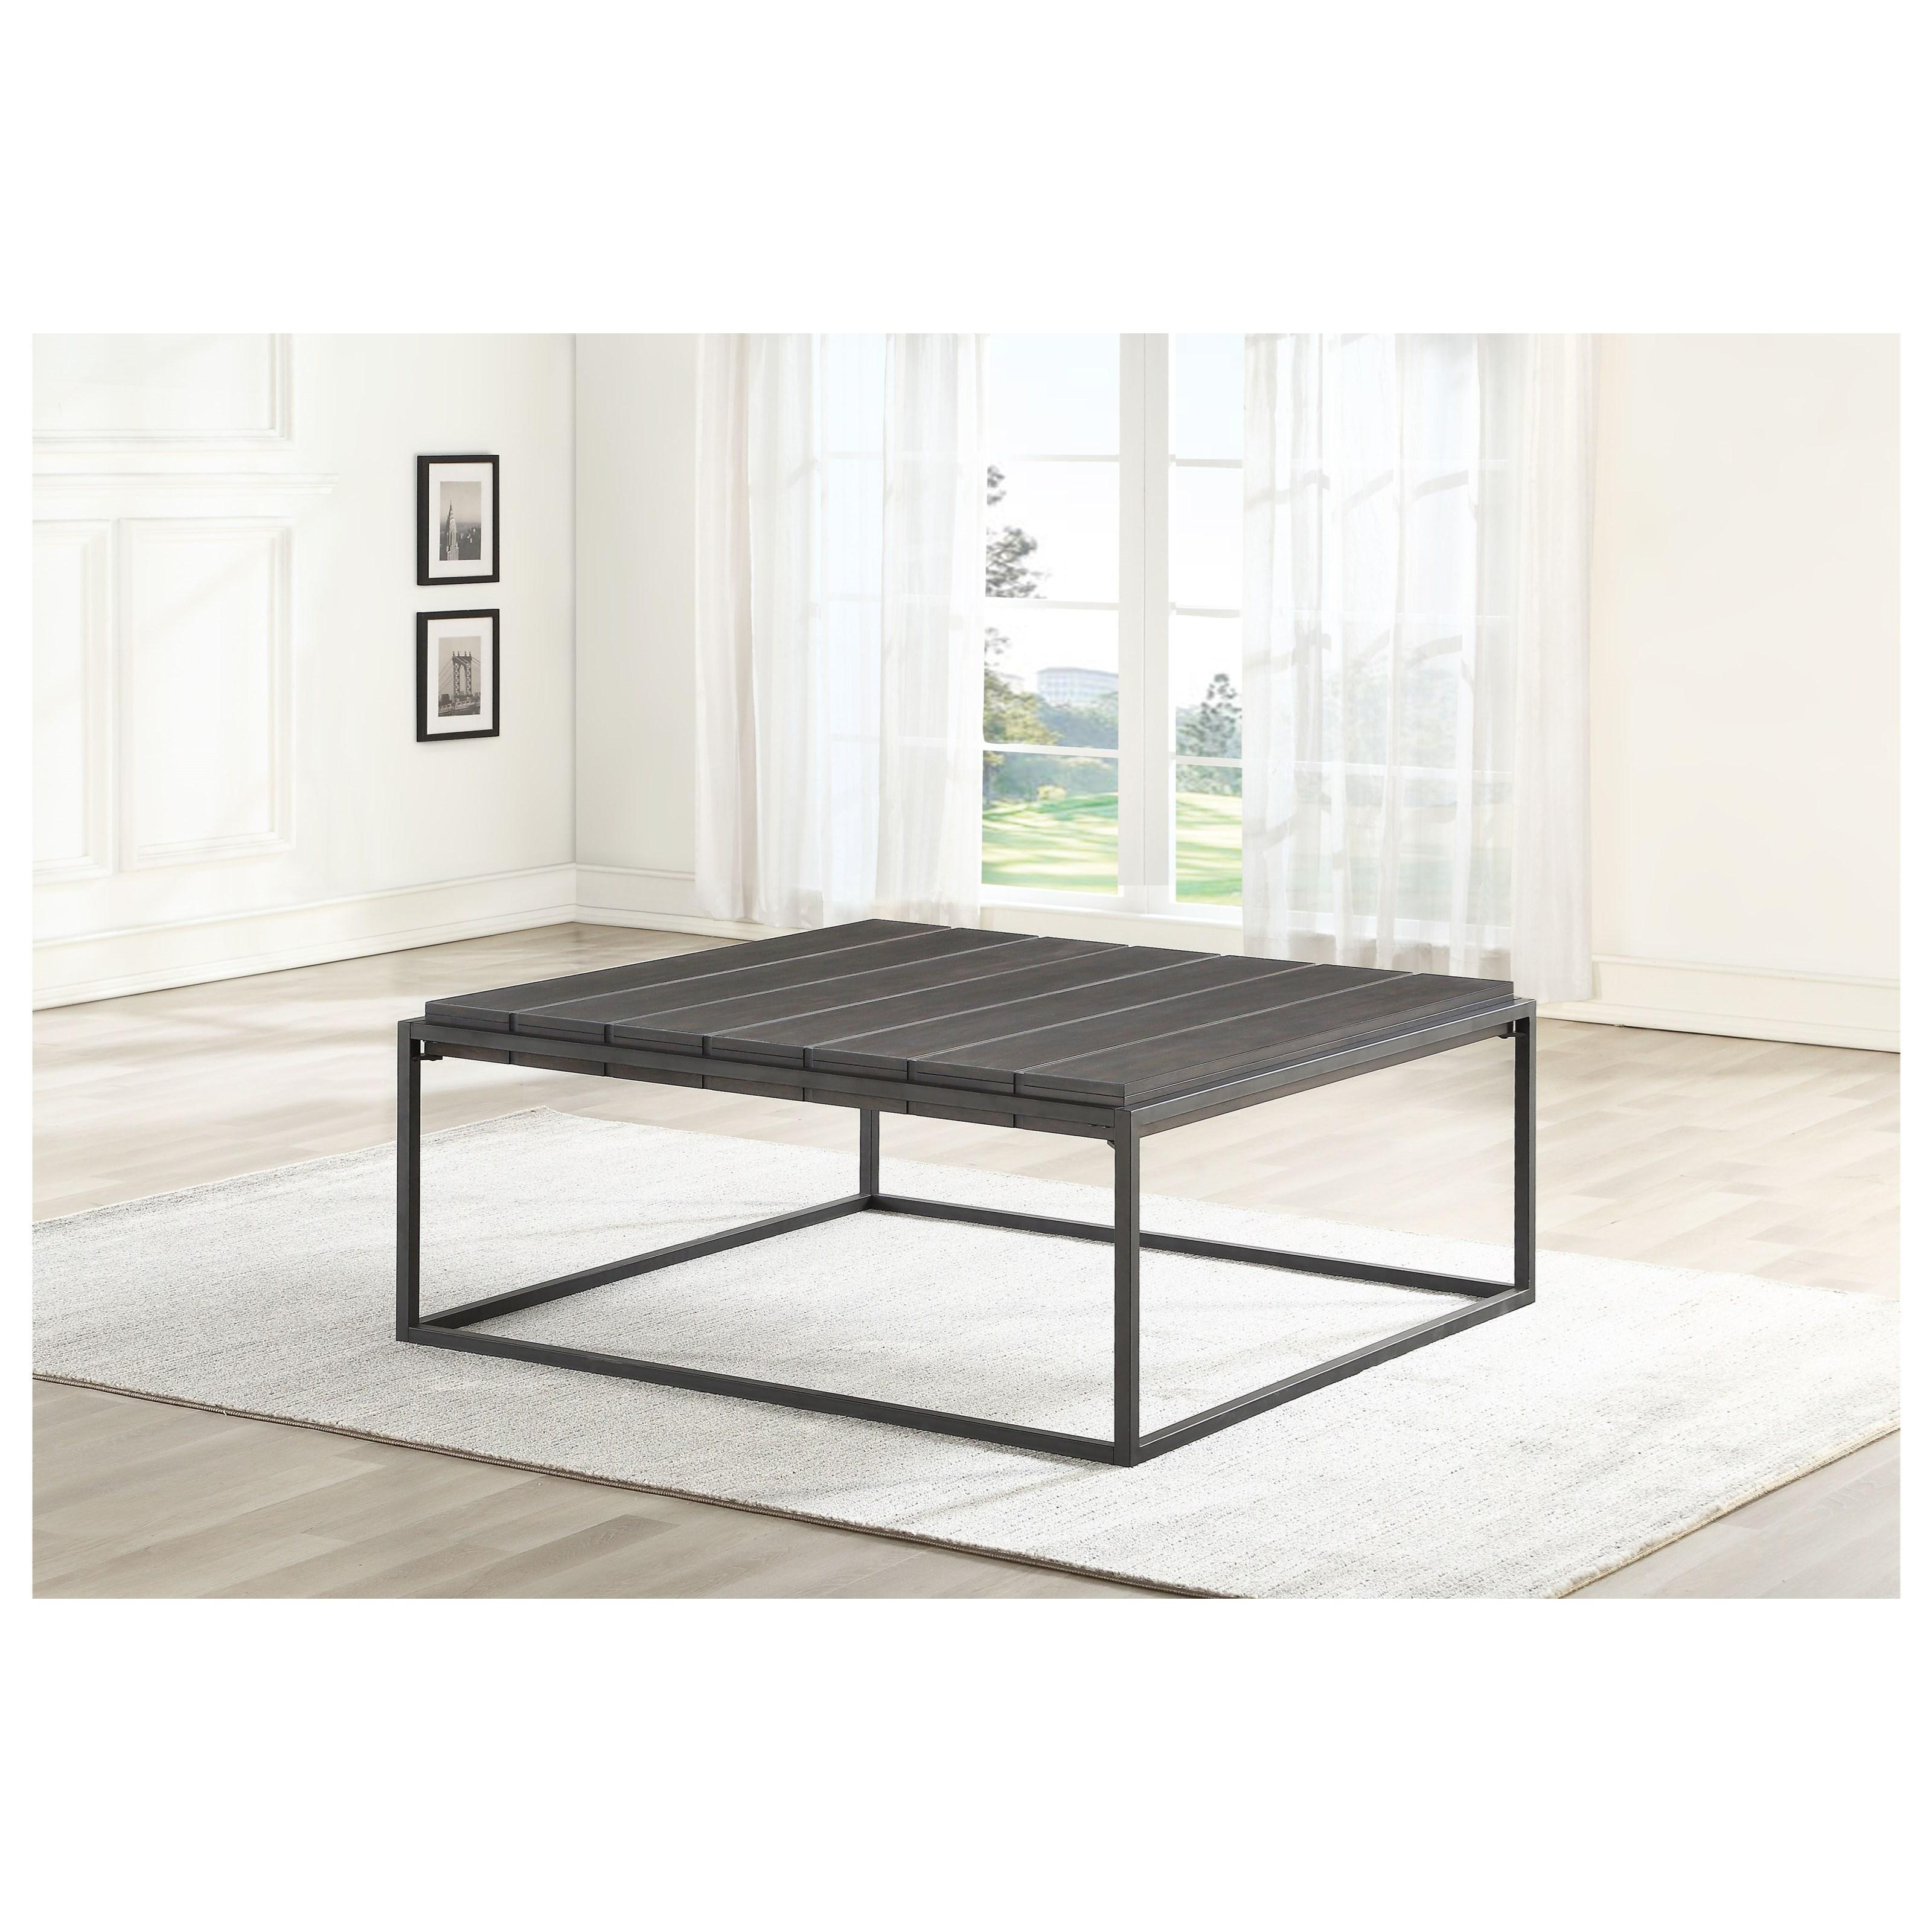 Tekoa Coffee Table  by Steve Silver at Walker's Furniture